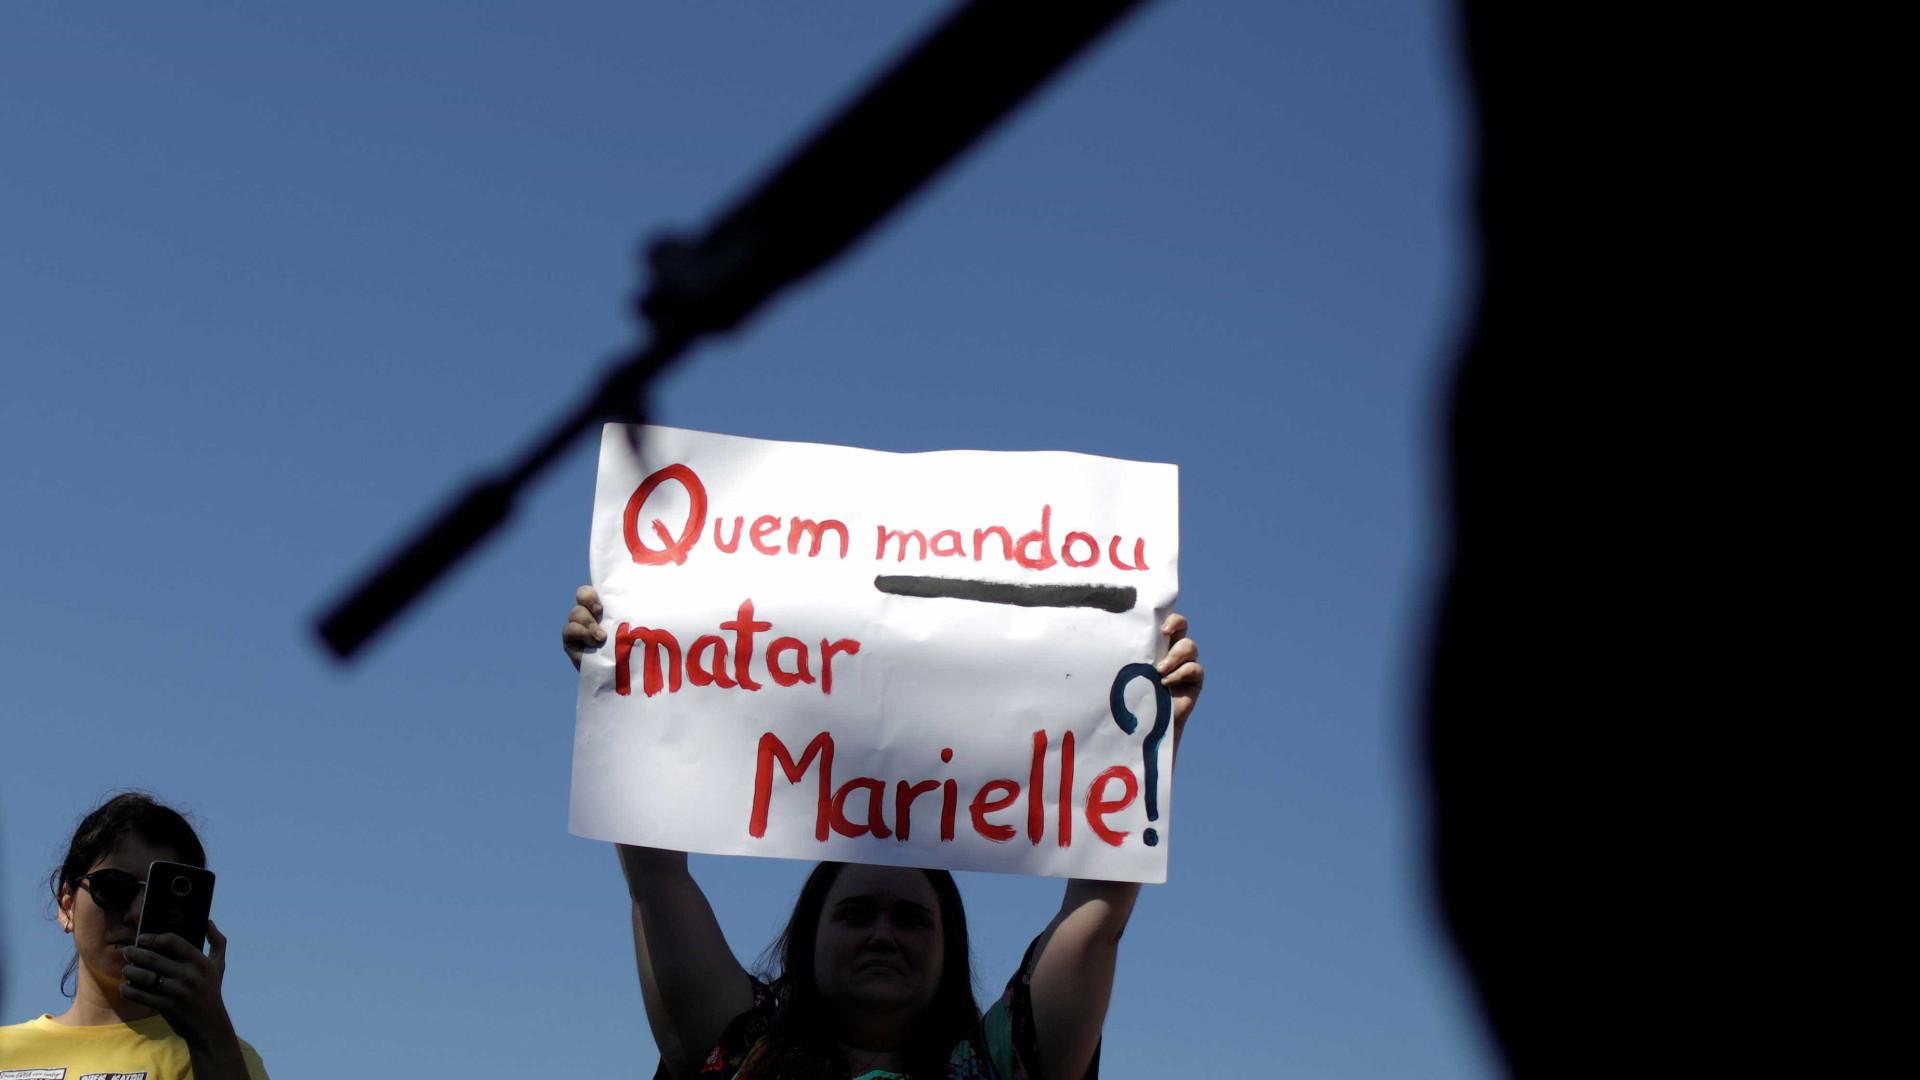 Caso Marielle: Anistia questiona imparcialidade da polícia